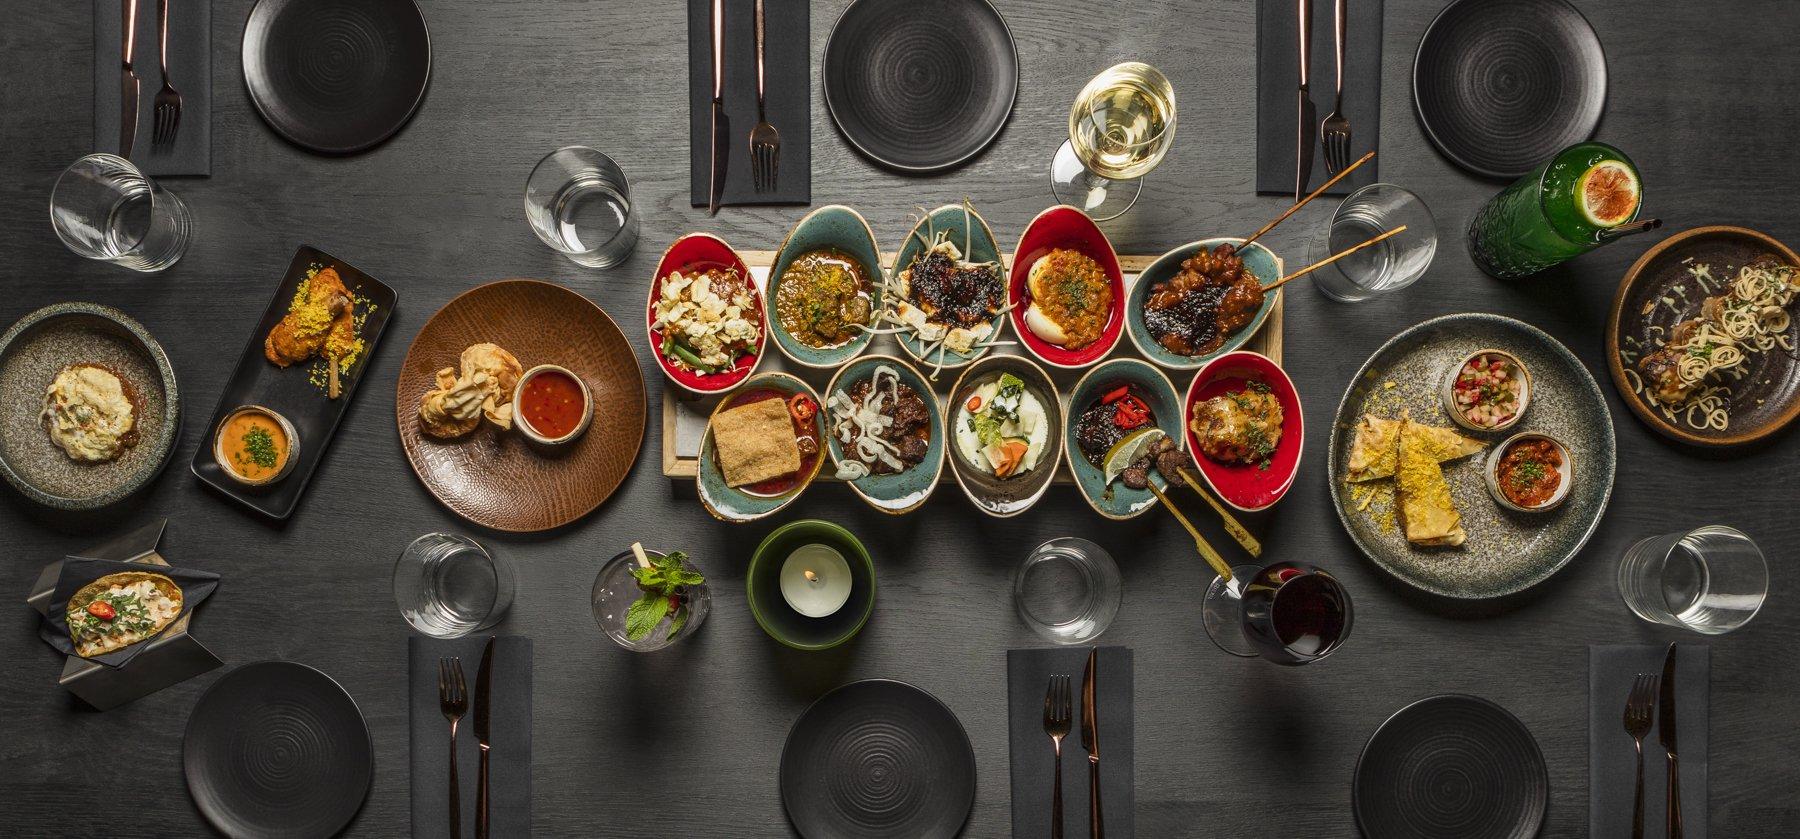 foodfotografie-haarlem-amsterdam